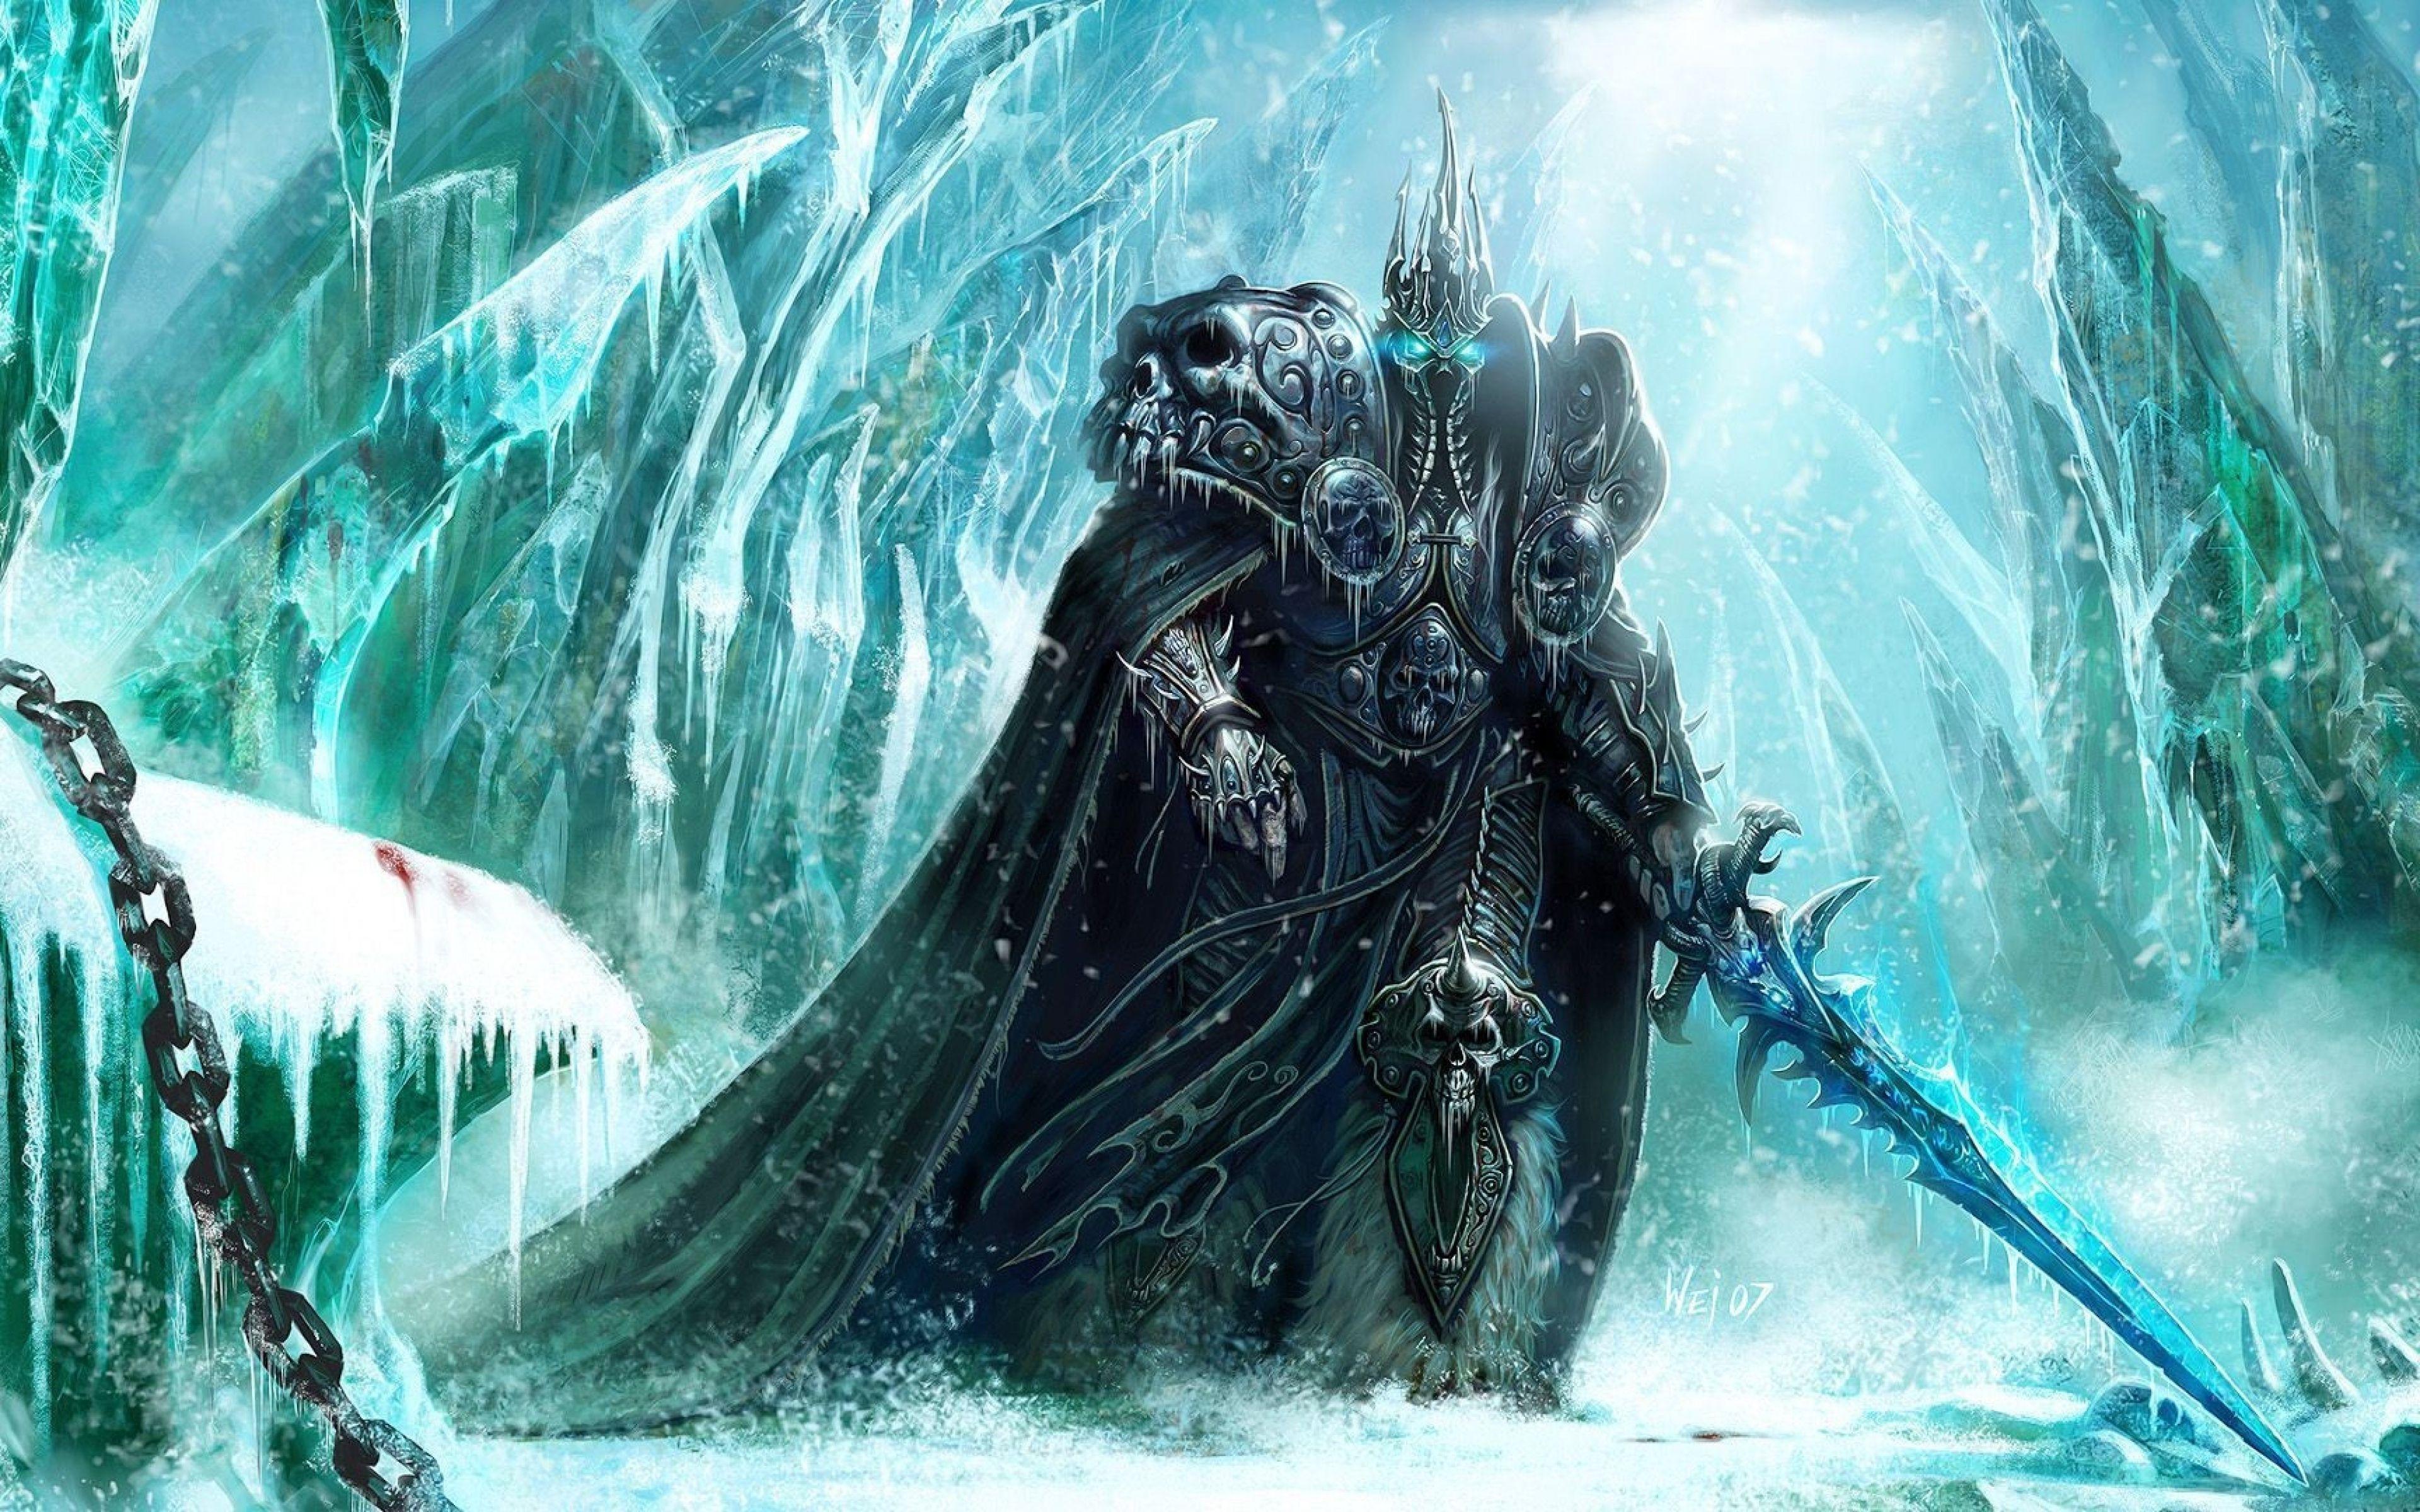 3840x2400 Wallpaper World Of Warcraft Lich King Sword